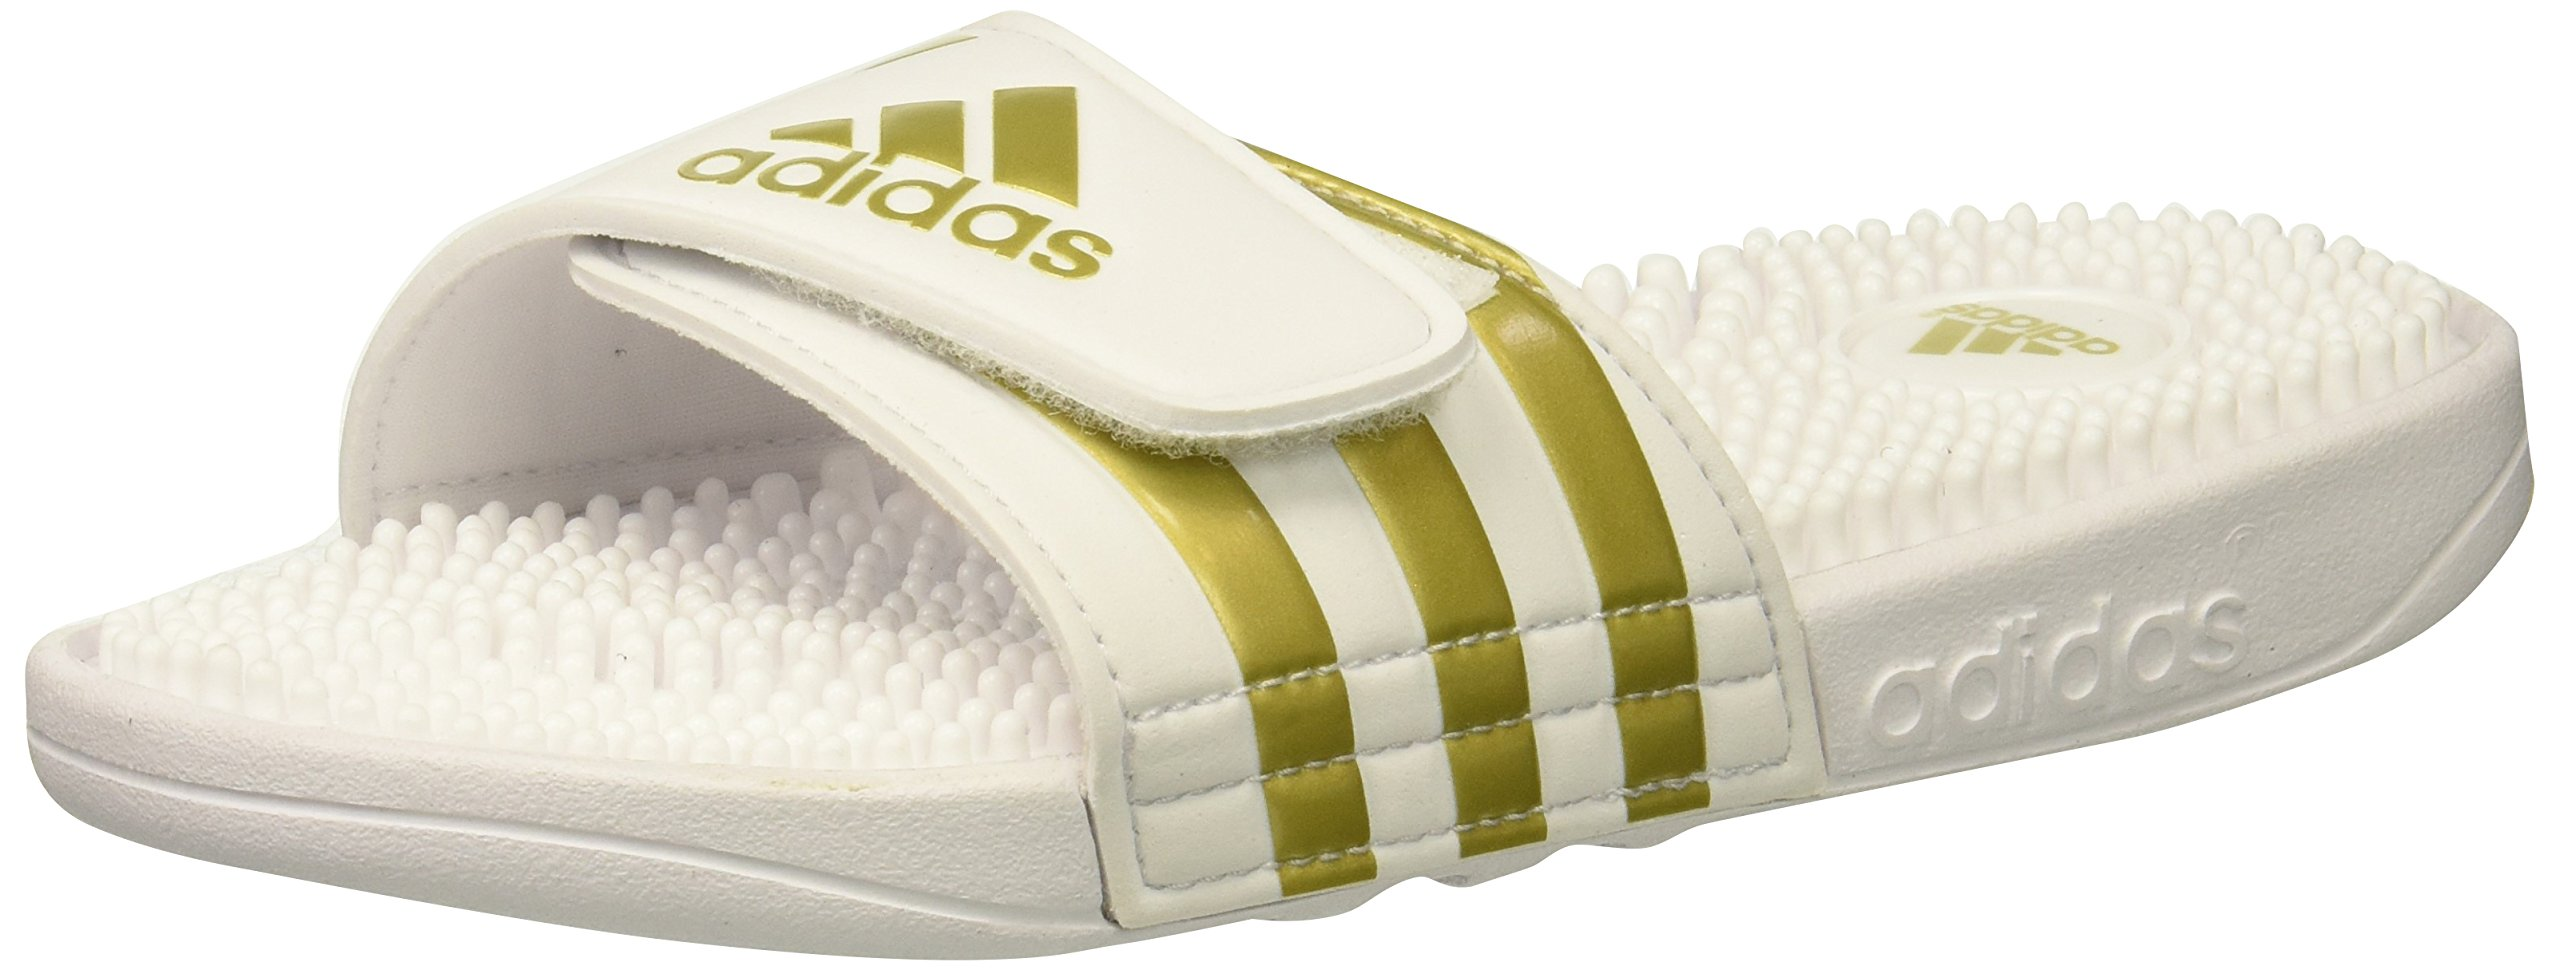 72b4c6621e30 Galleon - Adidas Men s Adissage Sport Sandal